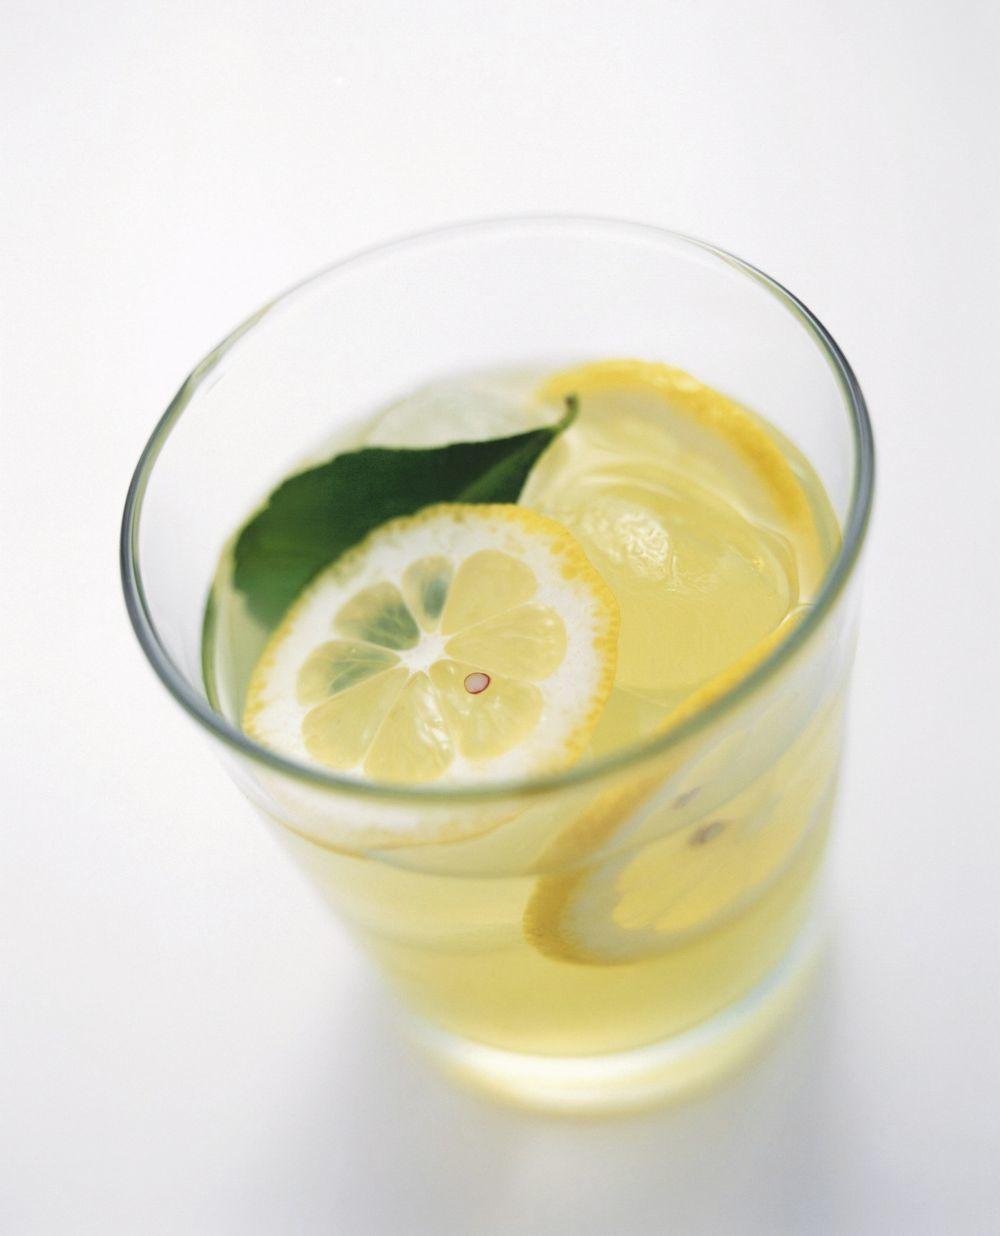 En cuanto tiempo se adelgaza tomando agua con limon